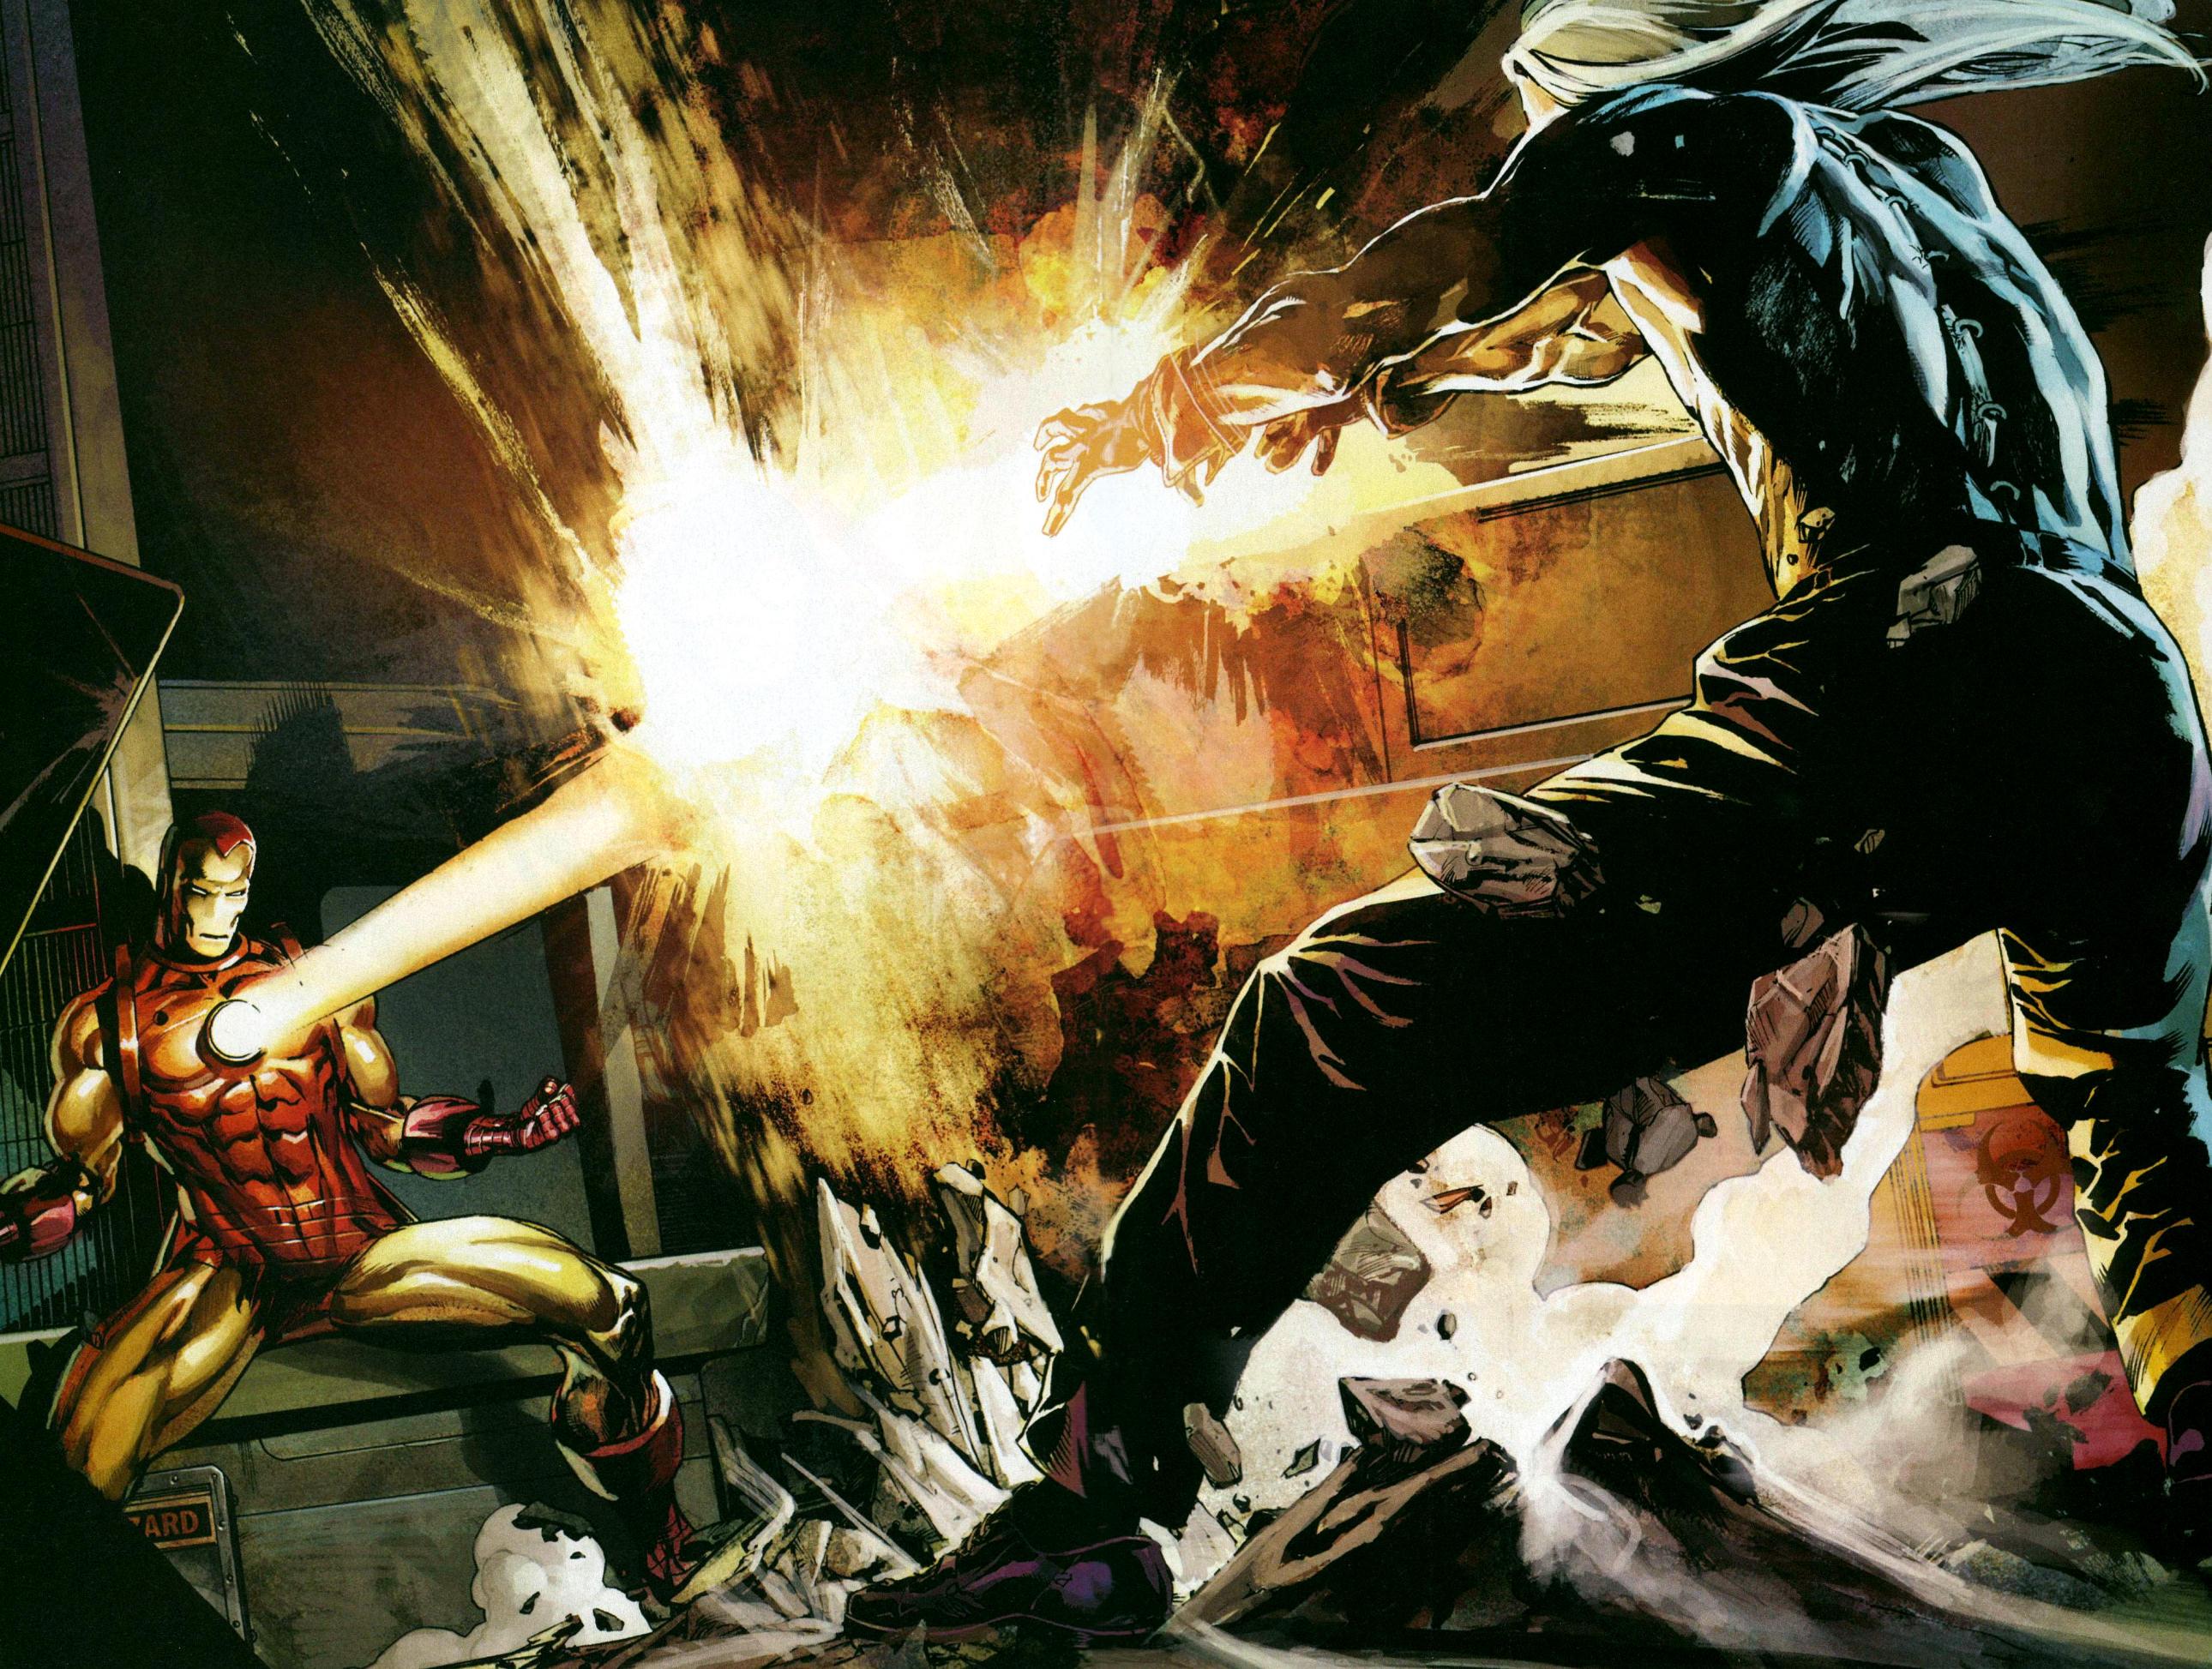 Iron Man vs. the Mandarin (Wallpoper)